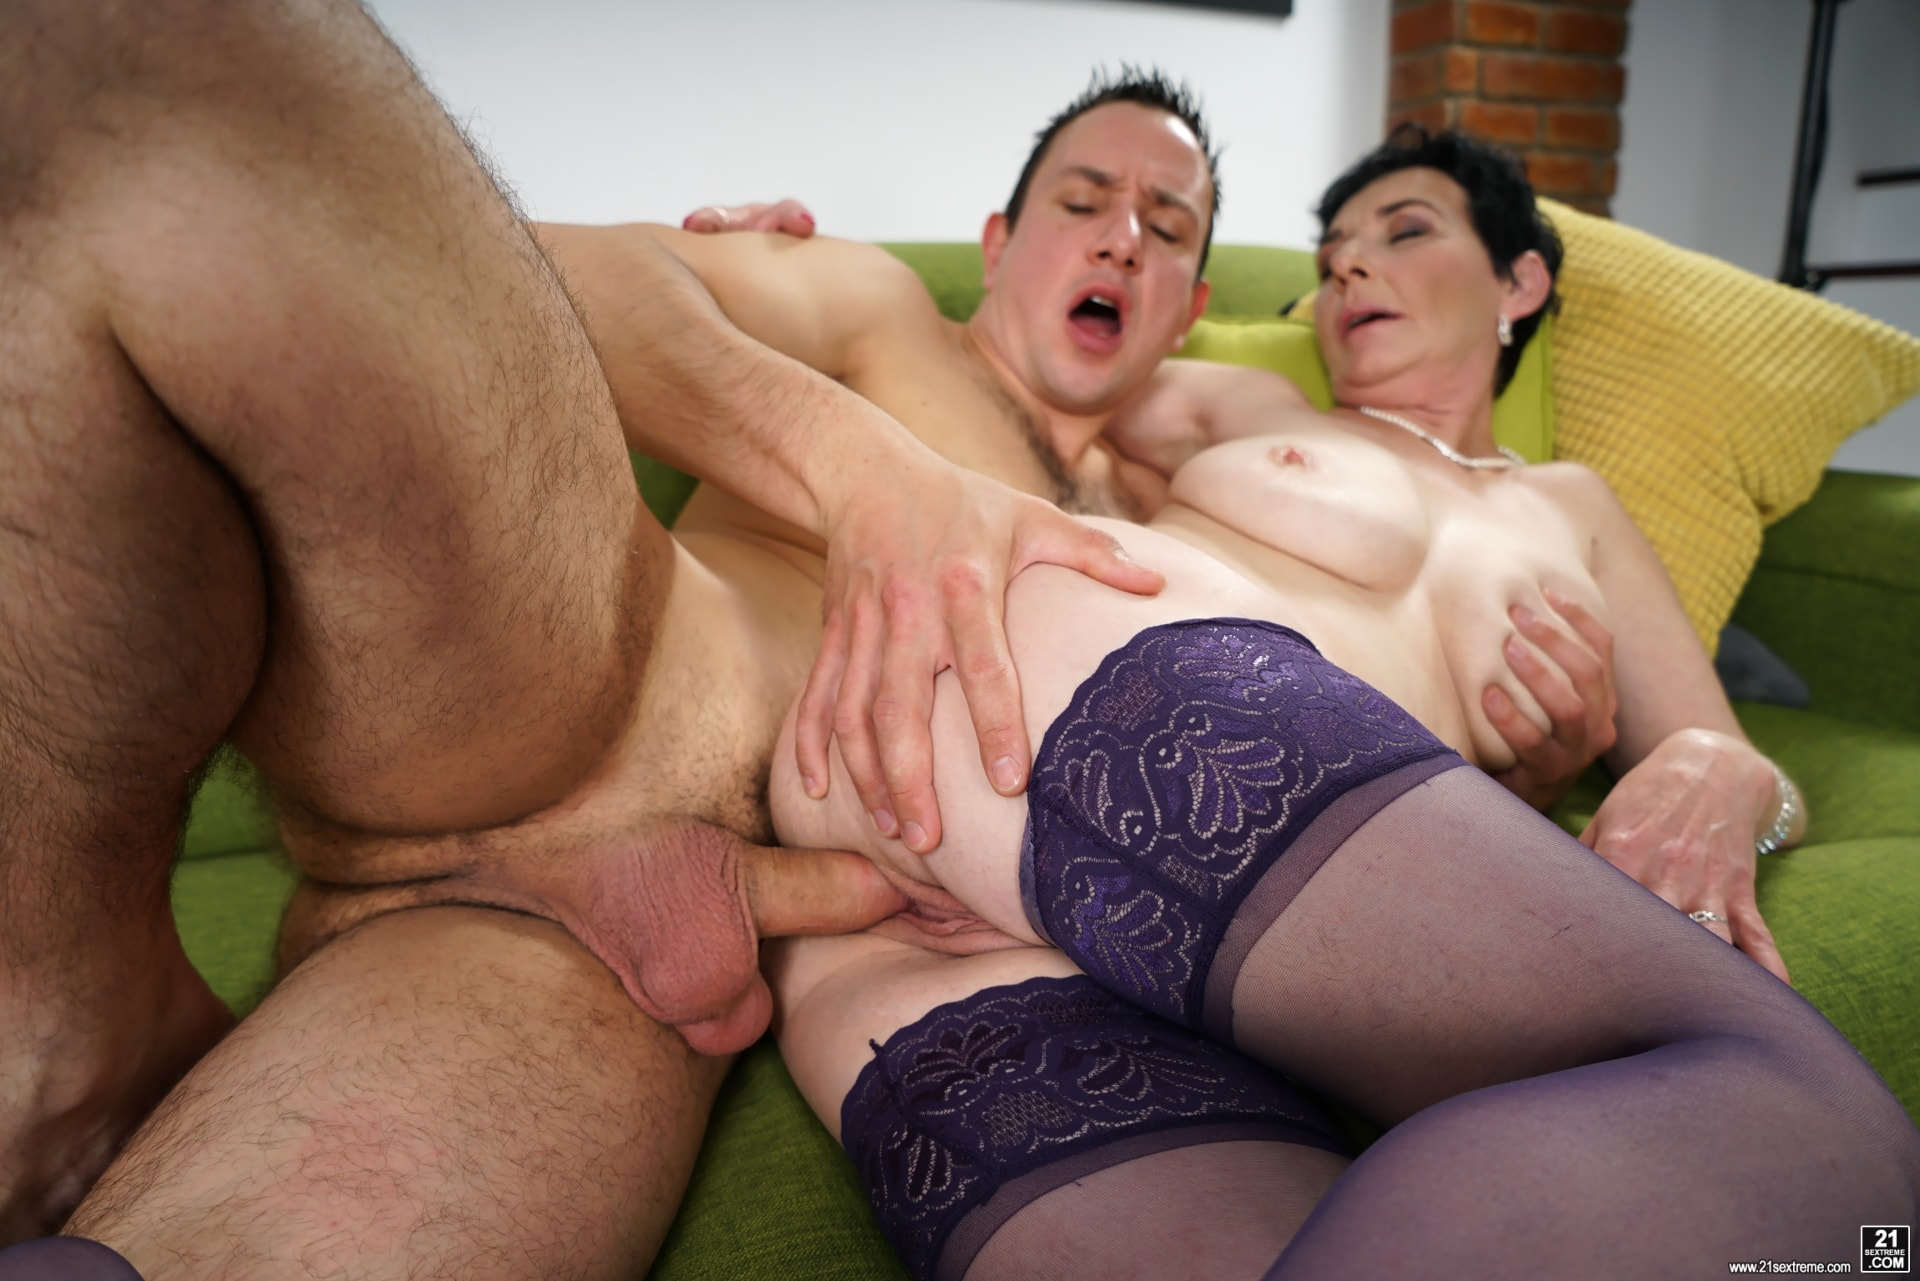 21Sextury 'Lust For Pixie' starring Pixie (Photo 223)